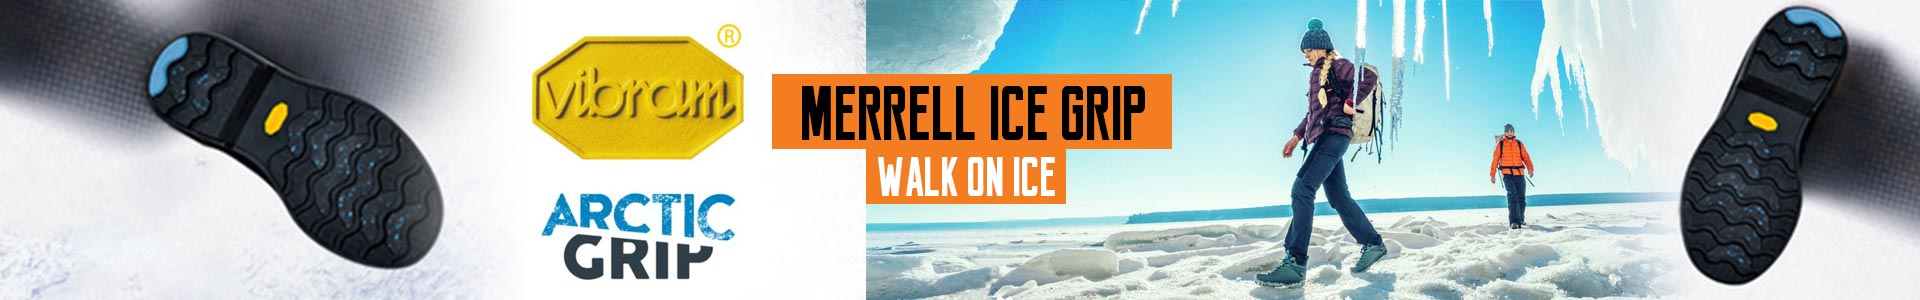 Shop Merrell Ice Grip